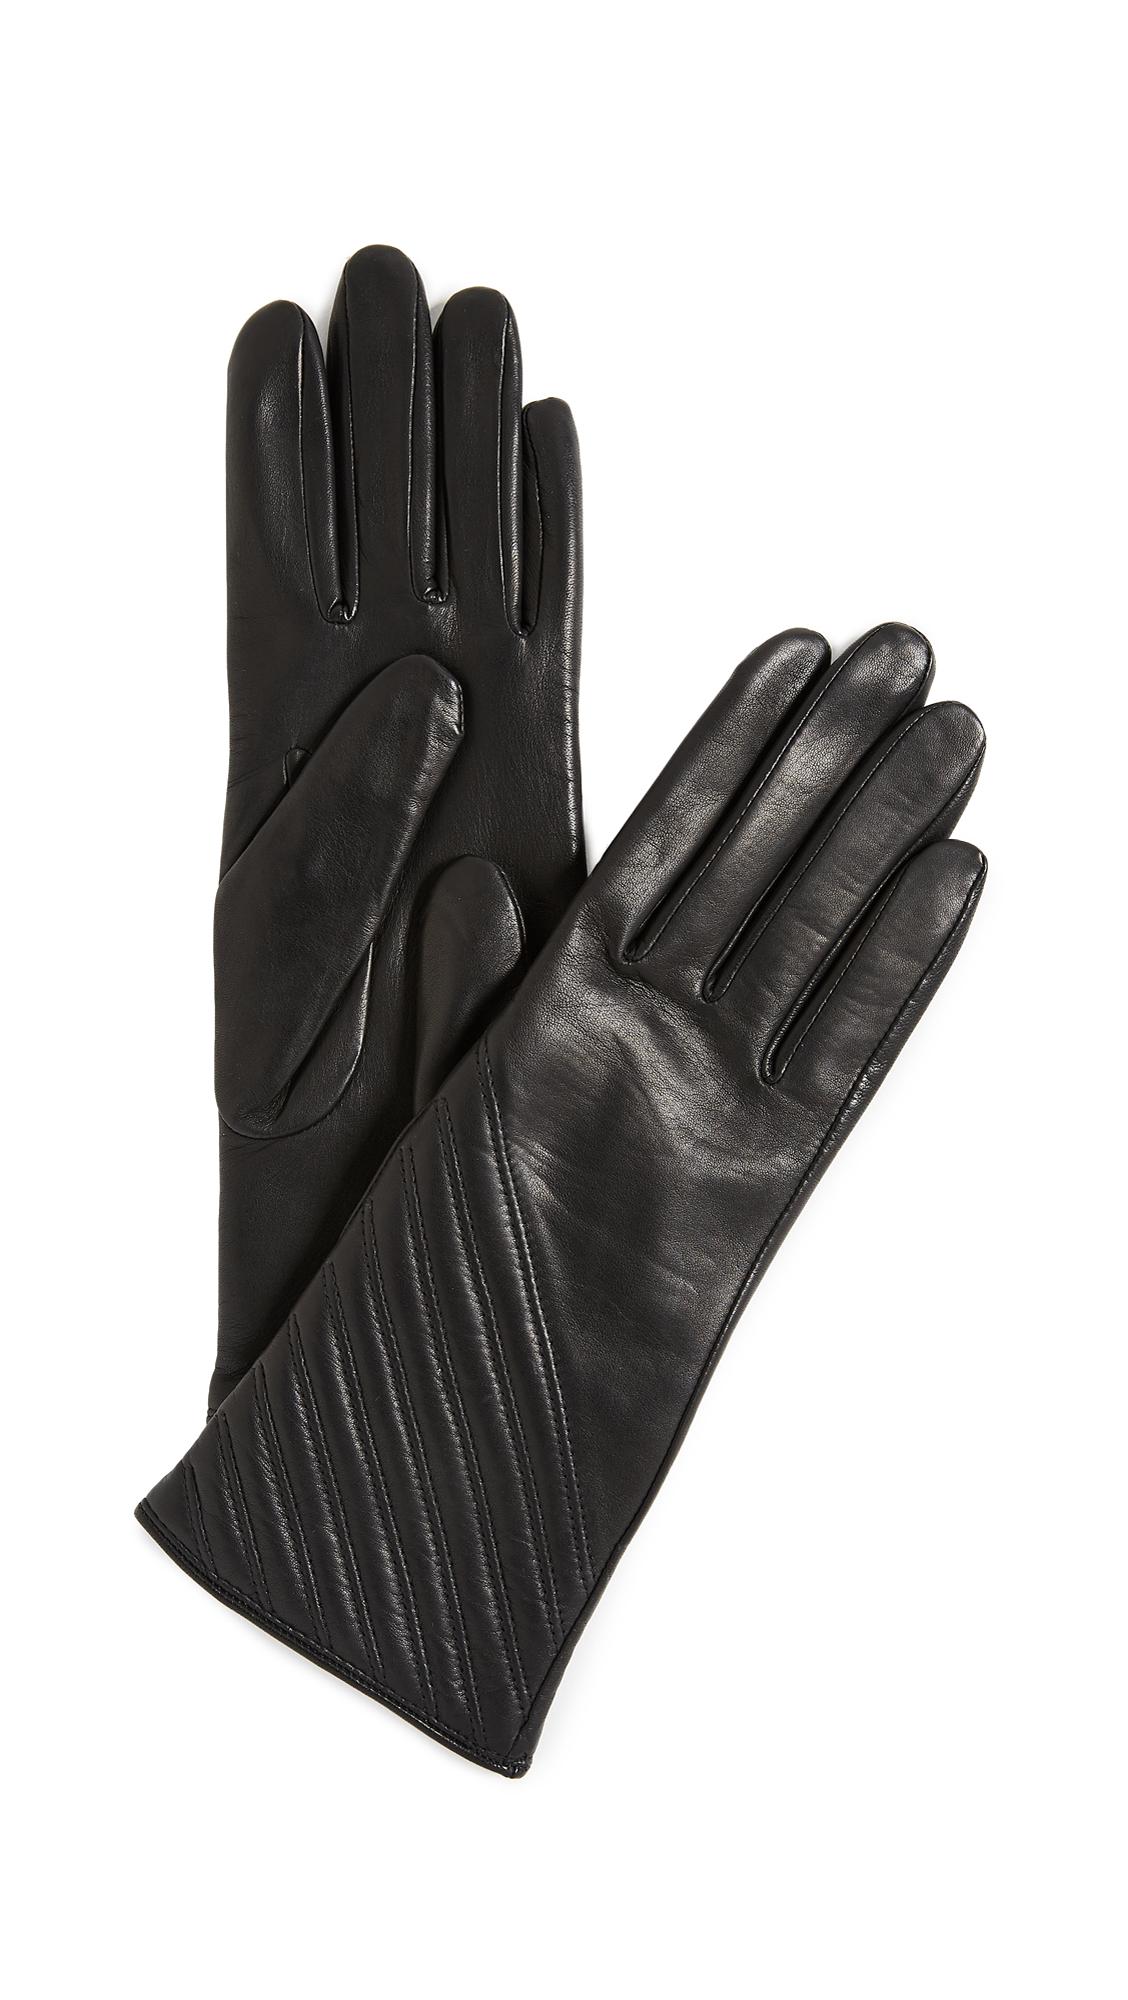 Rag & Bone Slant Gloves - Black